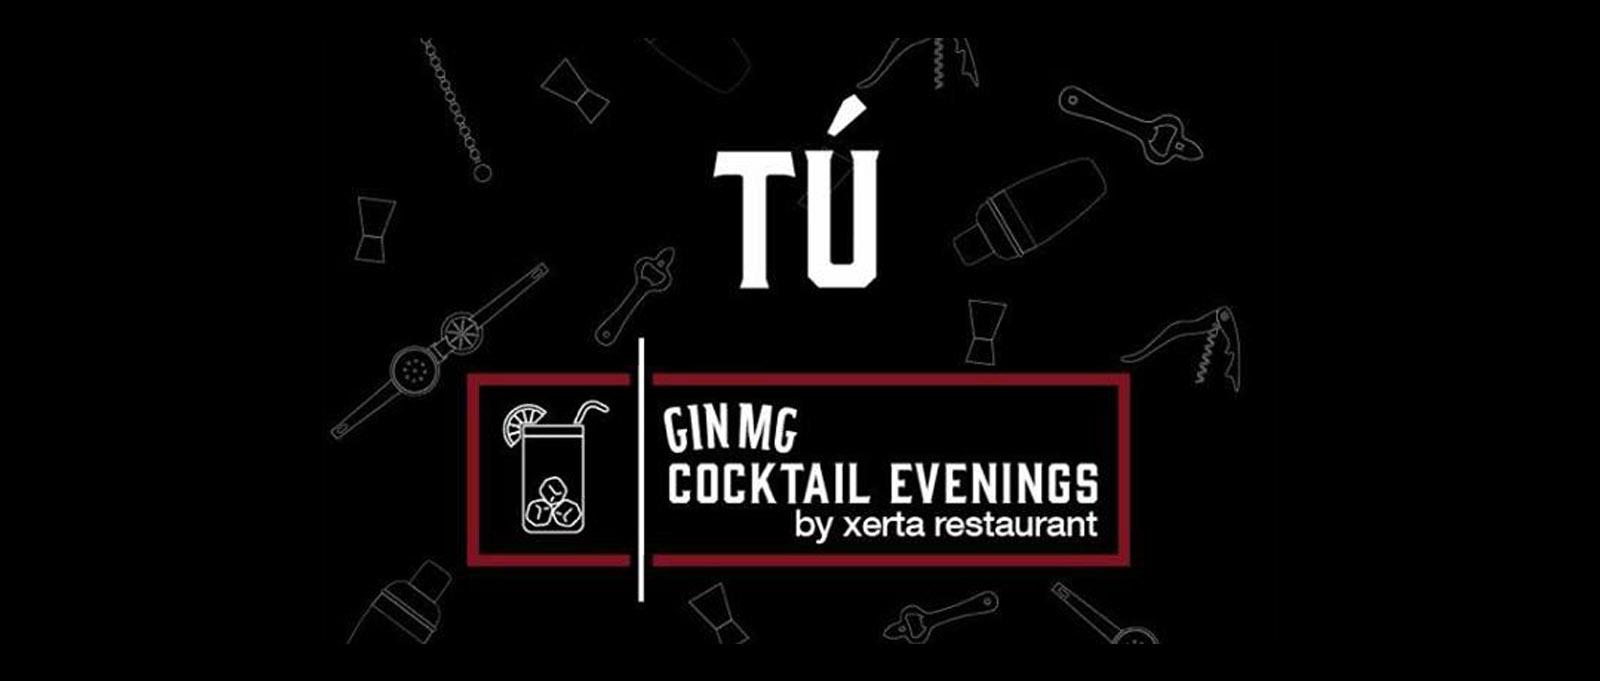 xerta restaurant gin mg cocktail evening